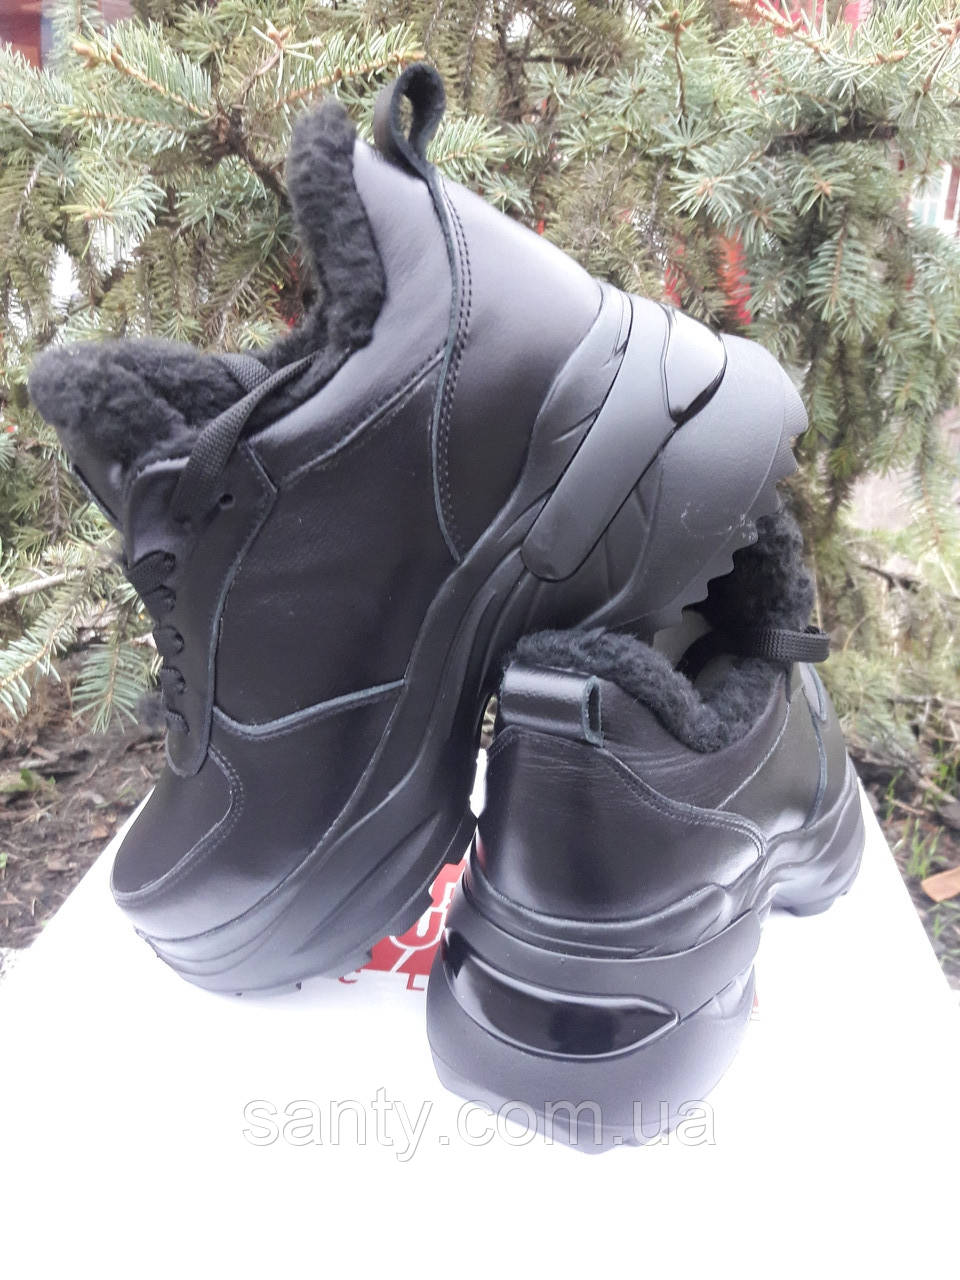 Женские зимние кроссовки из натуральной кожи. Жіночі зимові кросівки.